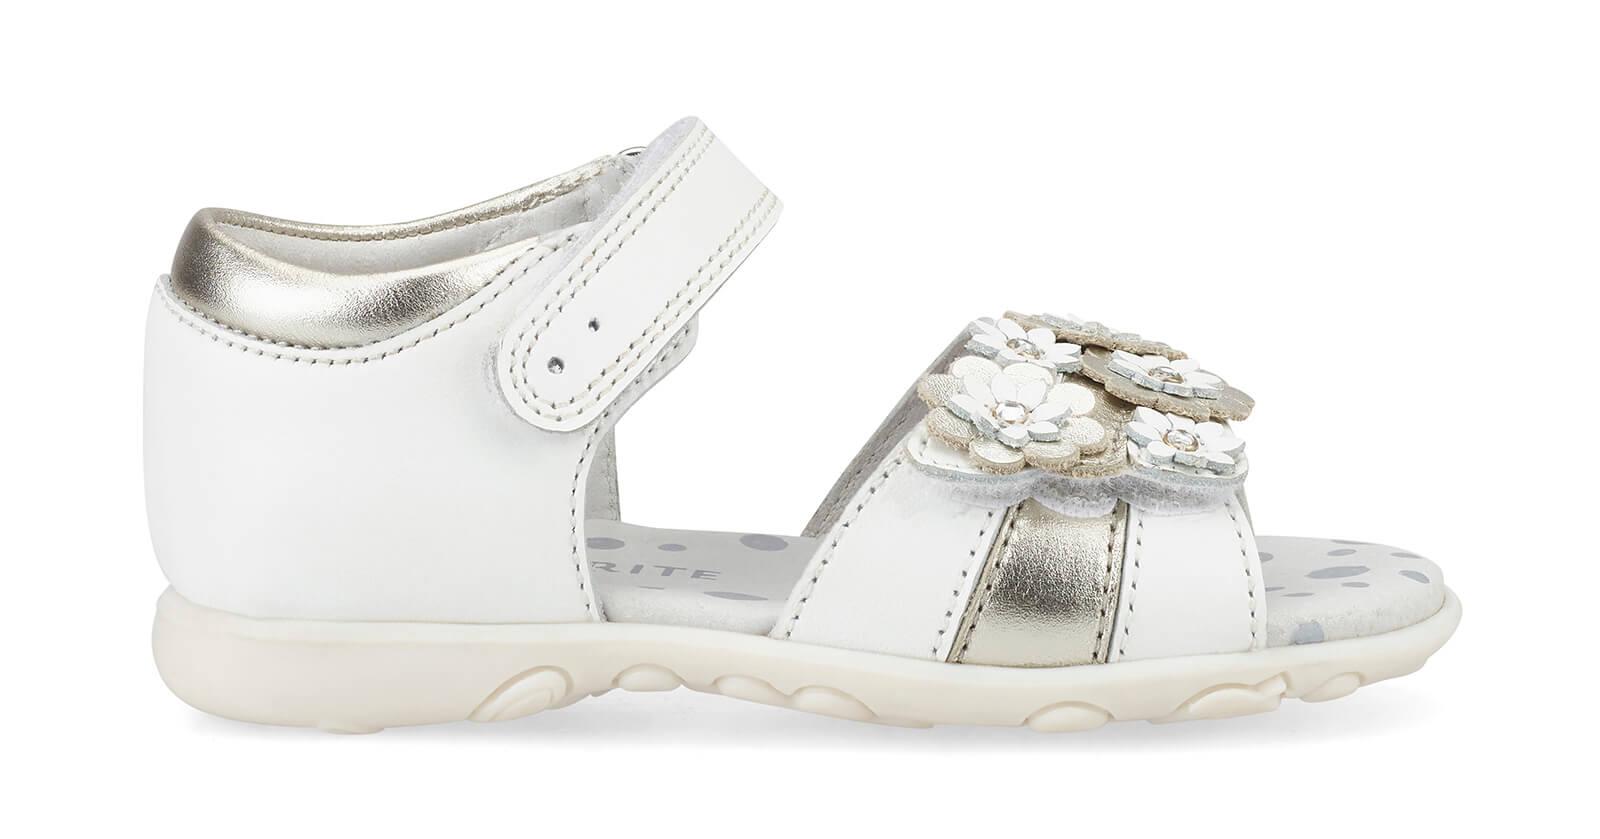 Bloom white sandals